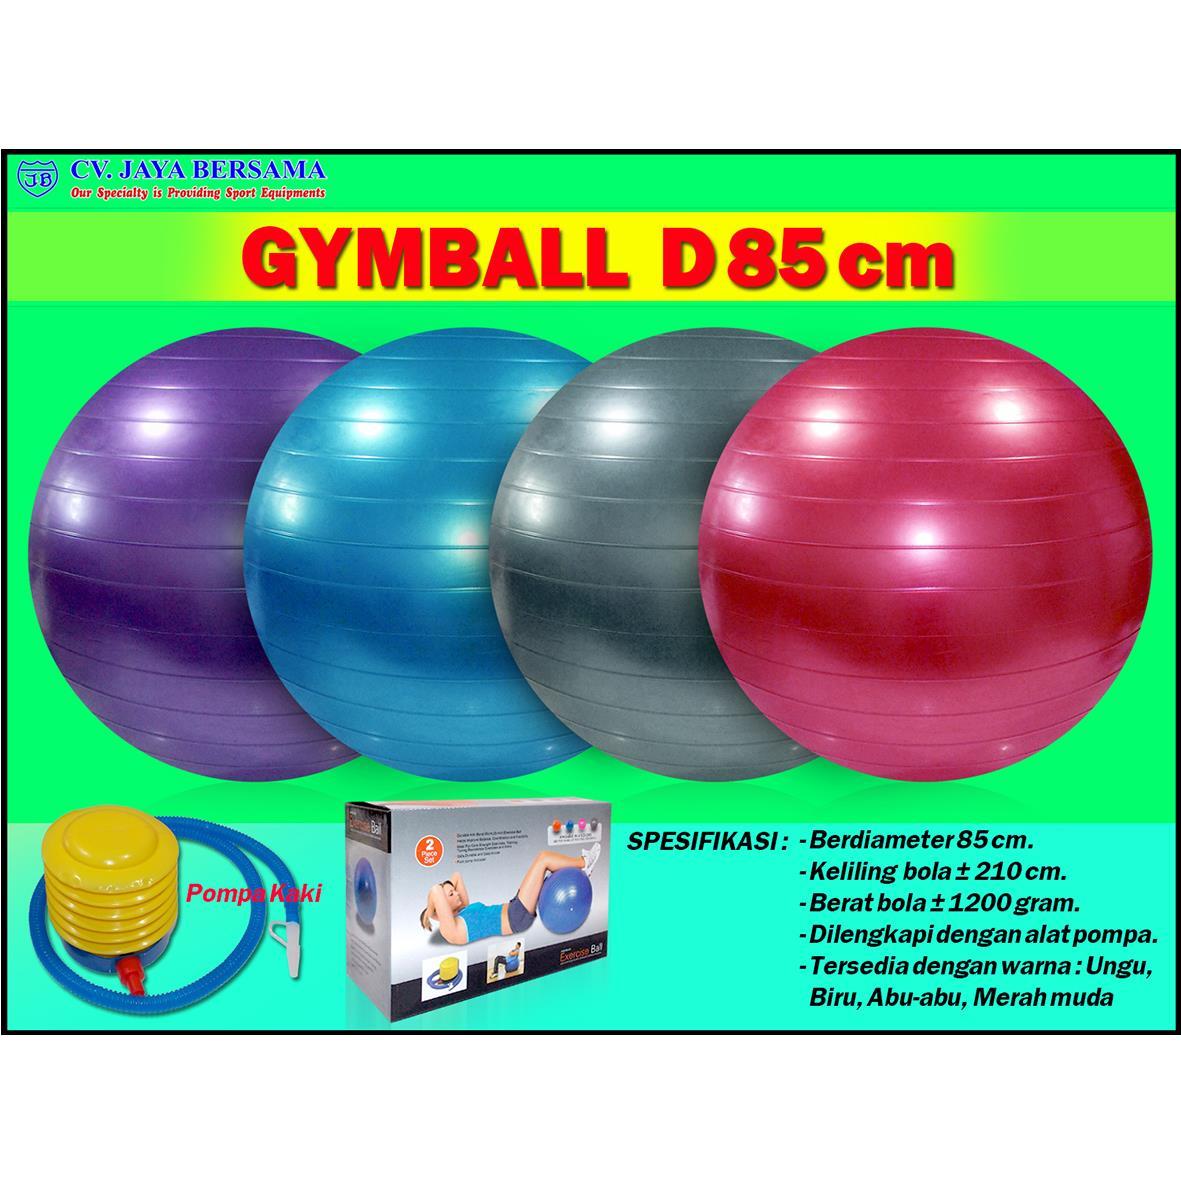 Sell Gymball Exercise D85 Cm From Indonesia By Cv Jaya Bersama Gym Ball Fitness Bola Olahraga Senam Yoga Kesehatan Bersamacheap Price